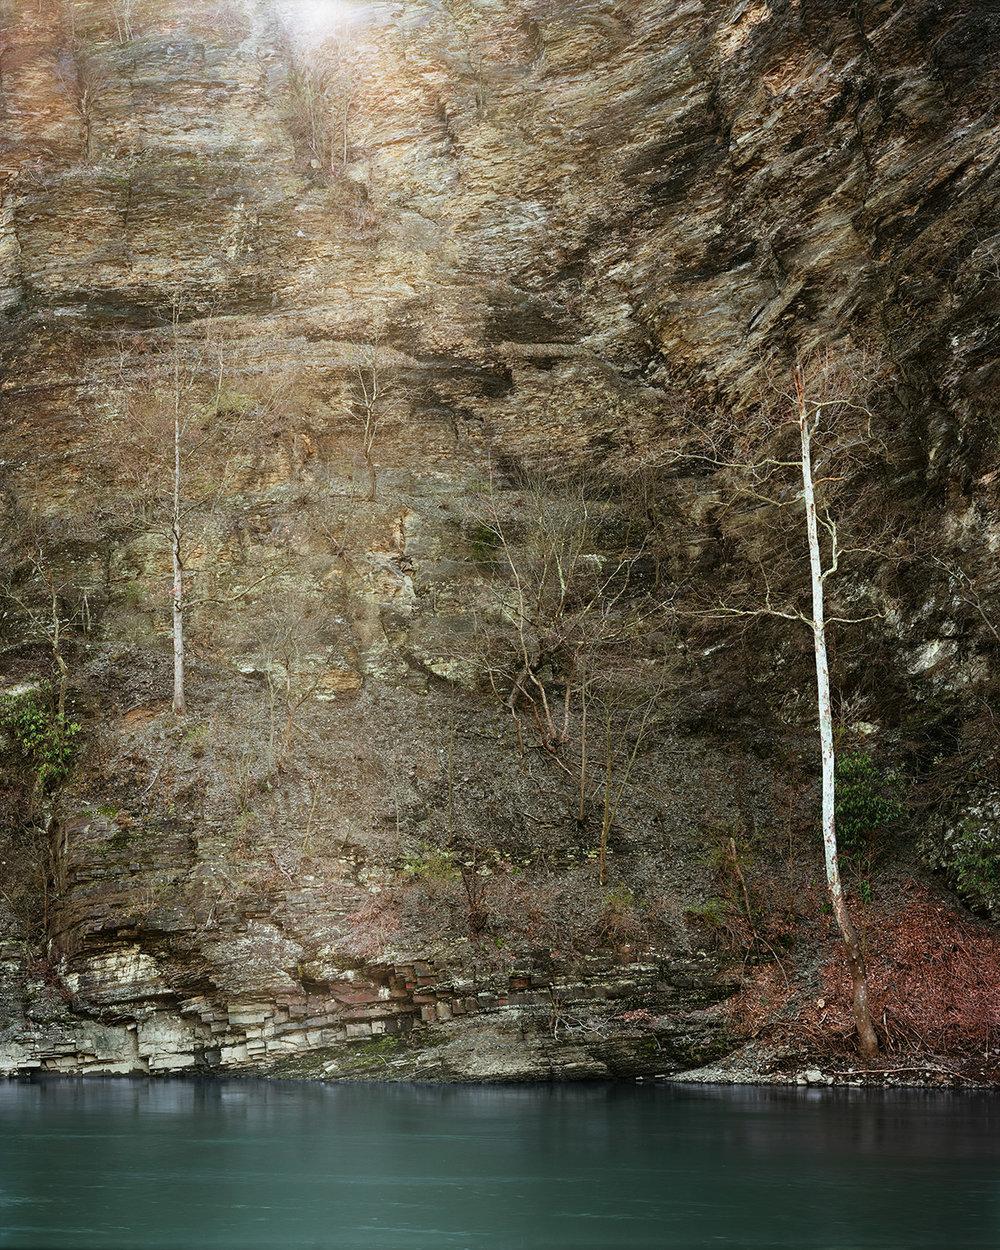 North Branch Potomac River, MD